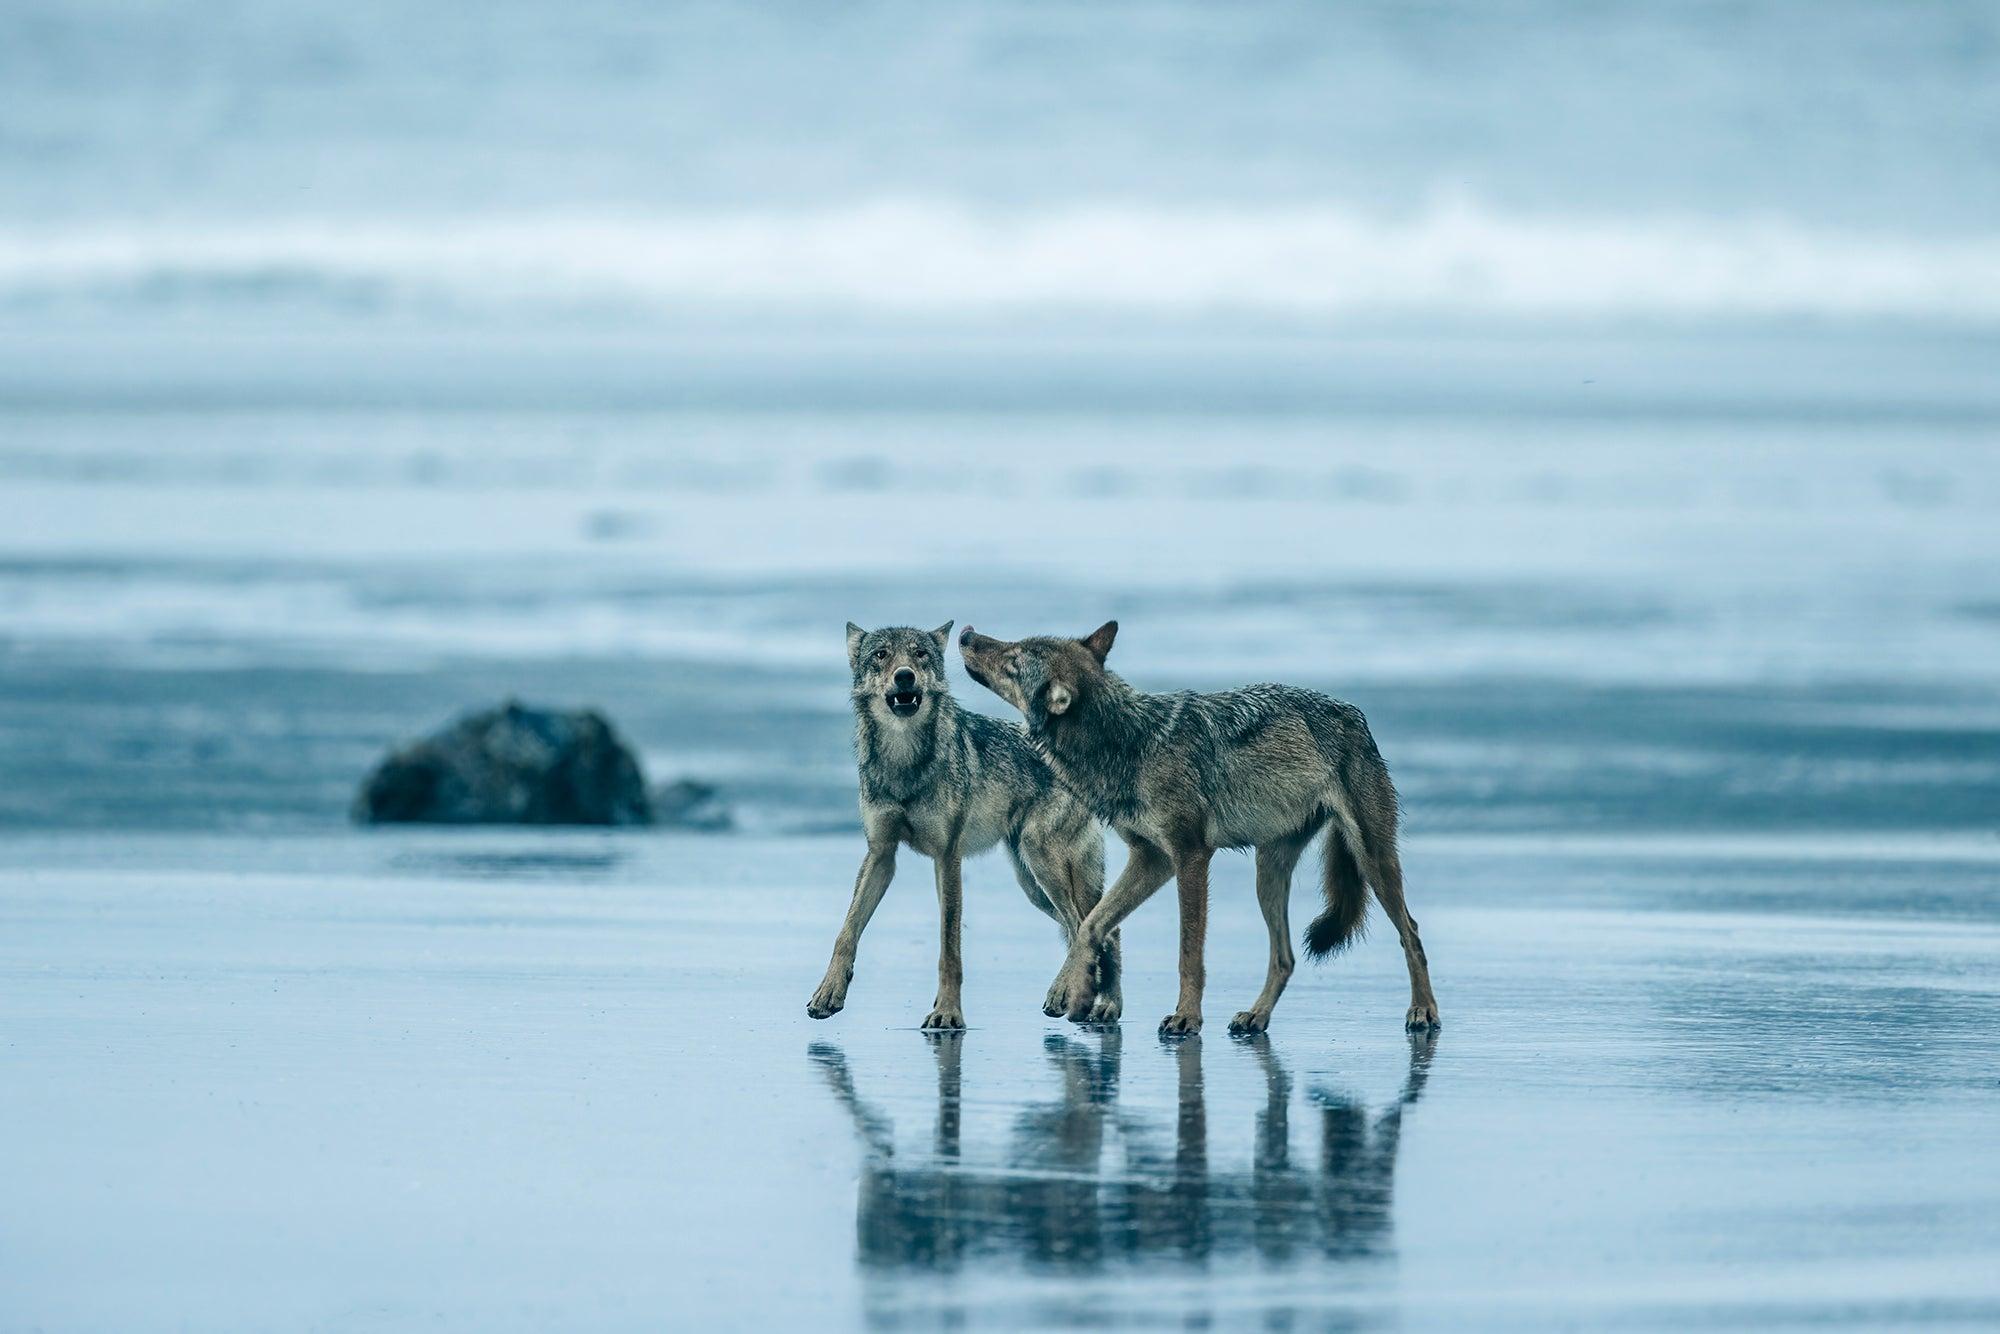 Coastal wolves play on a remote beach